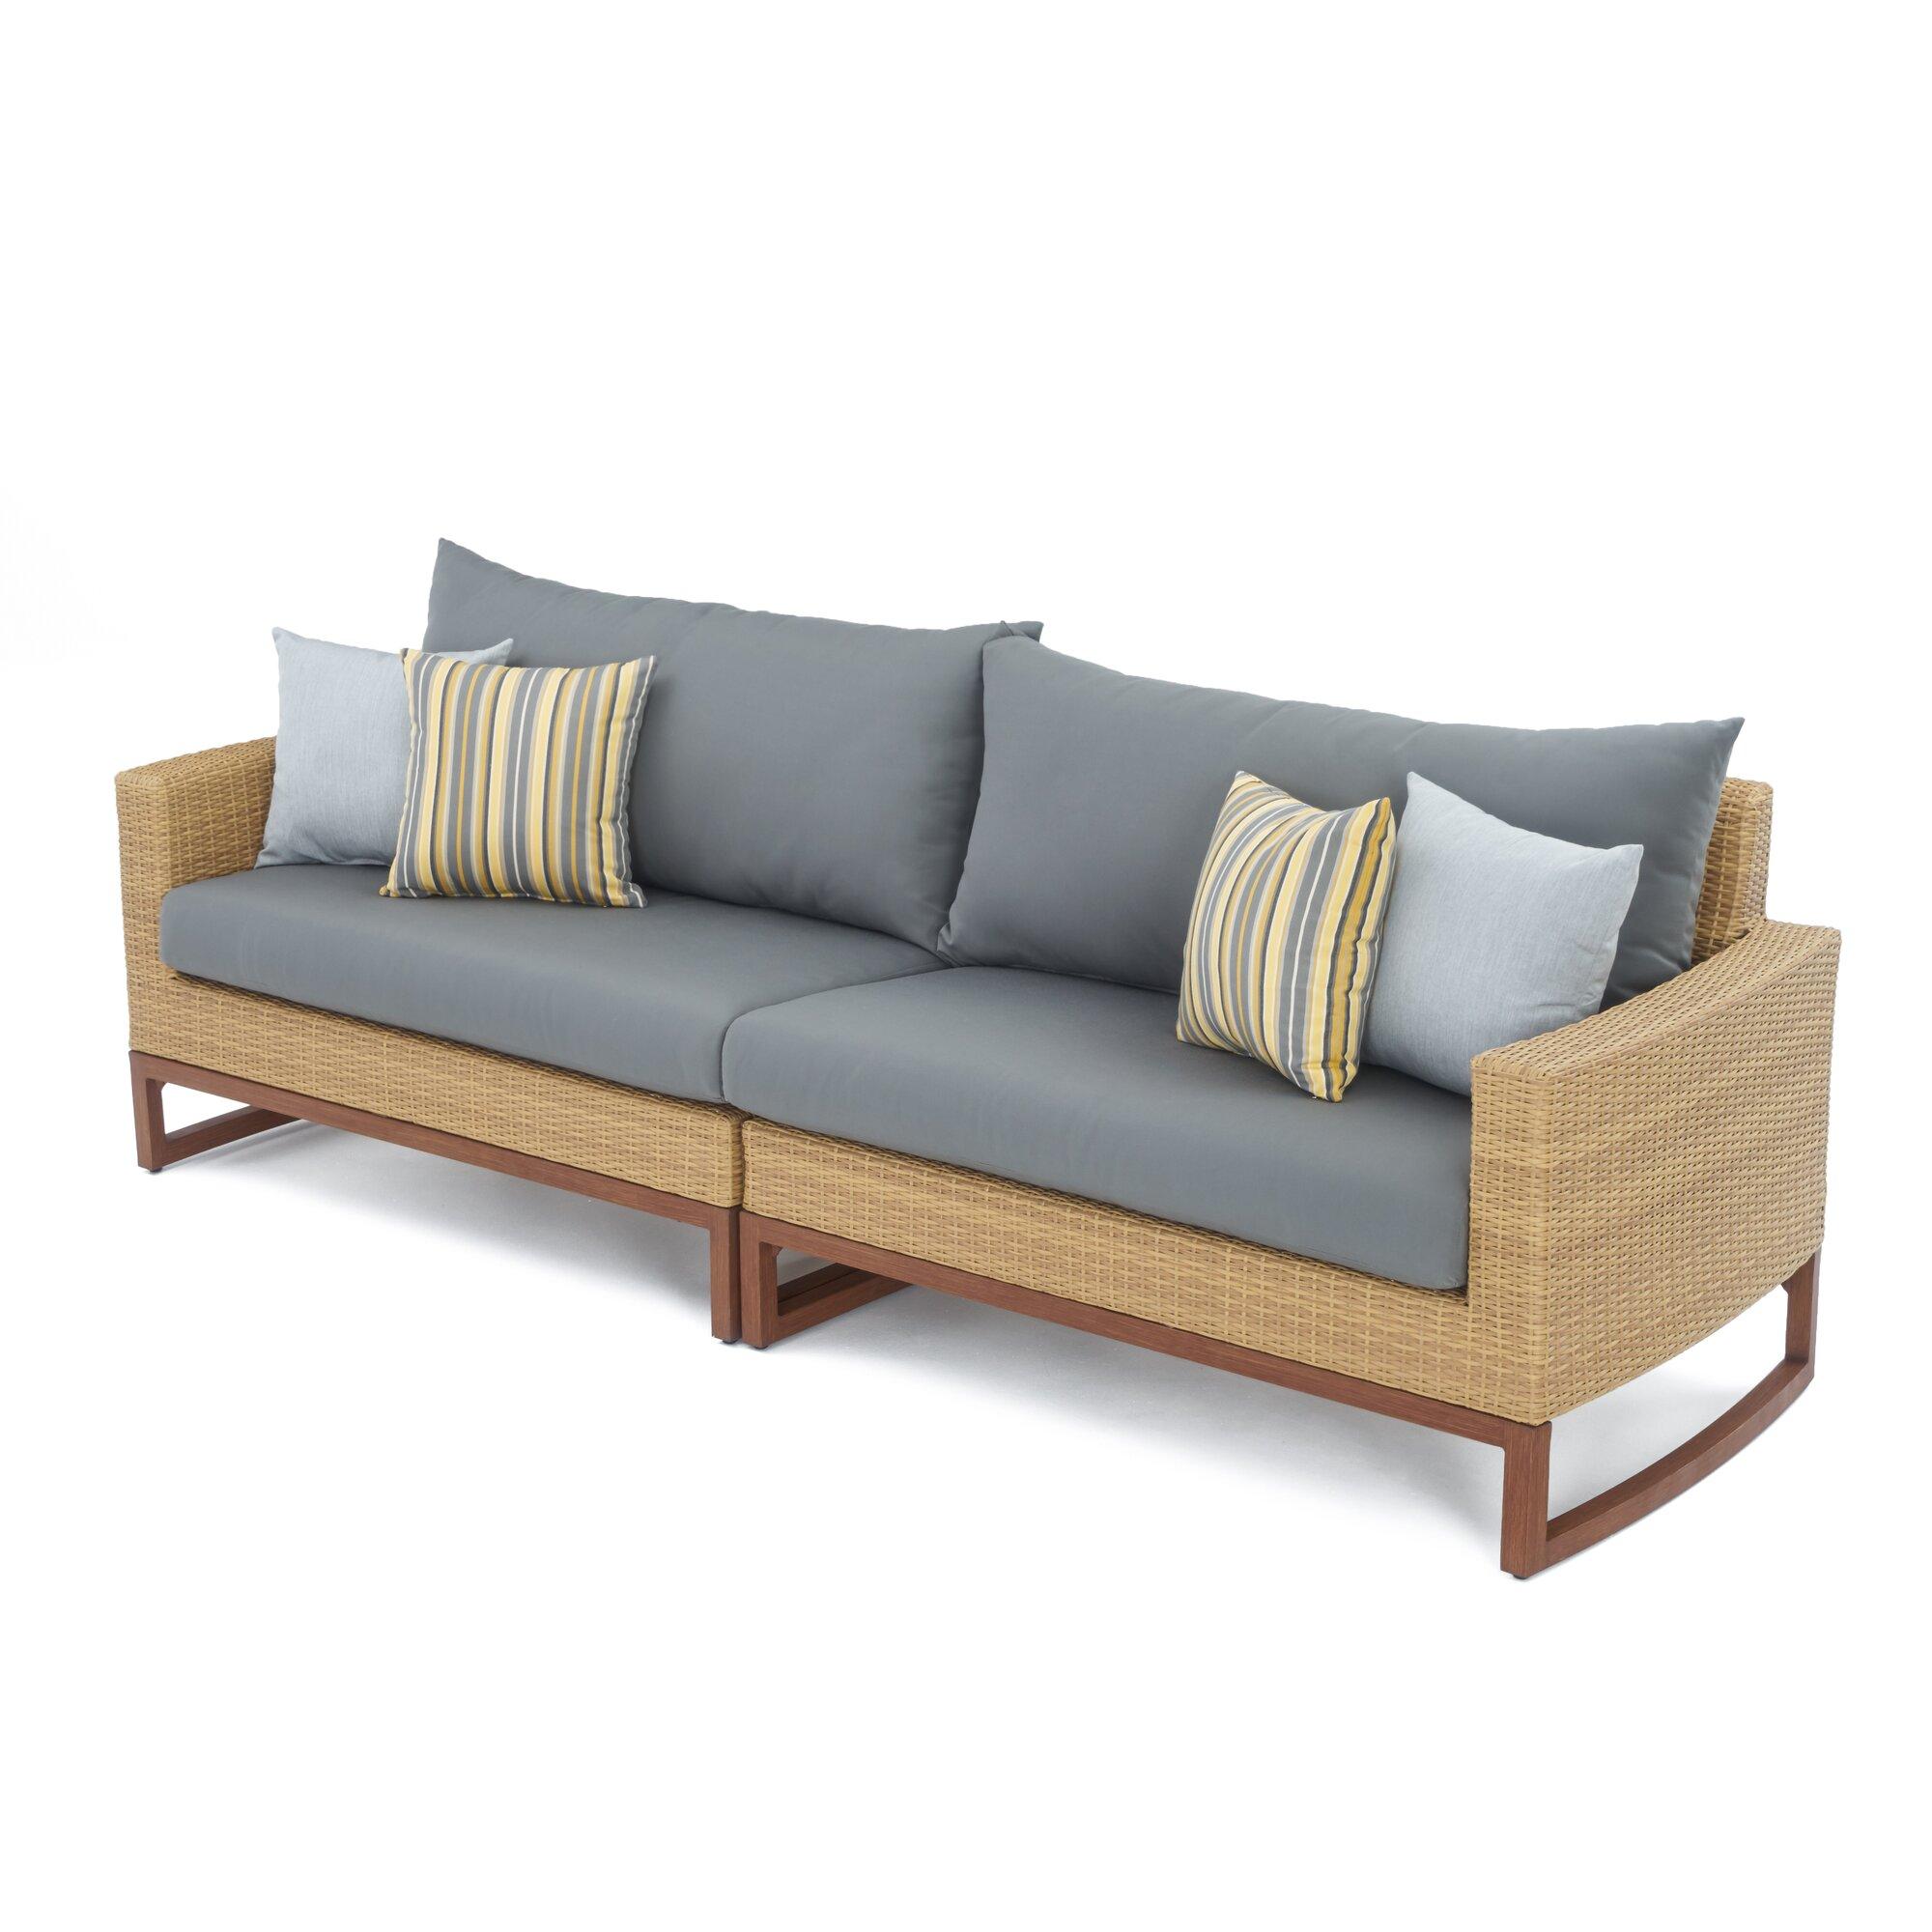 Addison 6 Piece Sectional Seating Group with Cushions : Joss u0026 Main